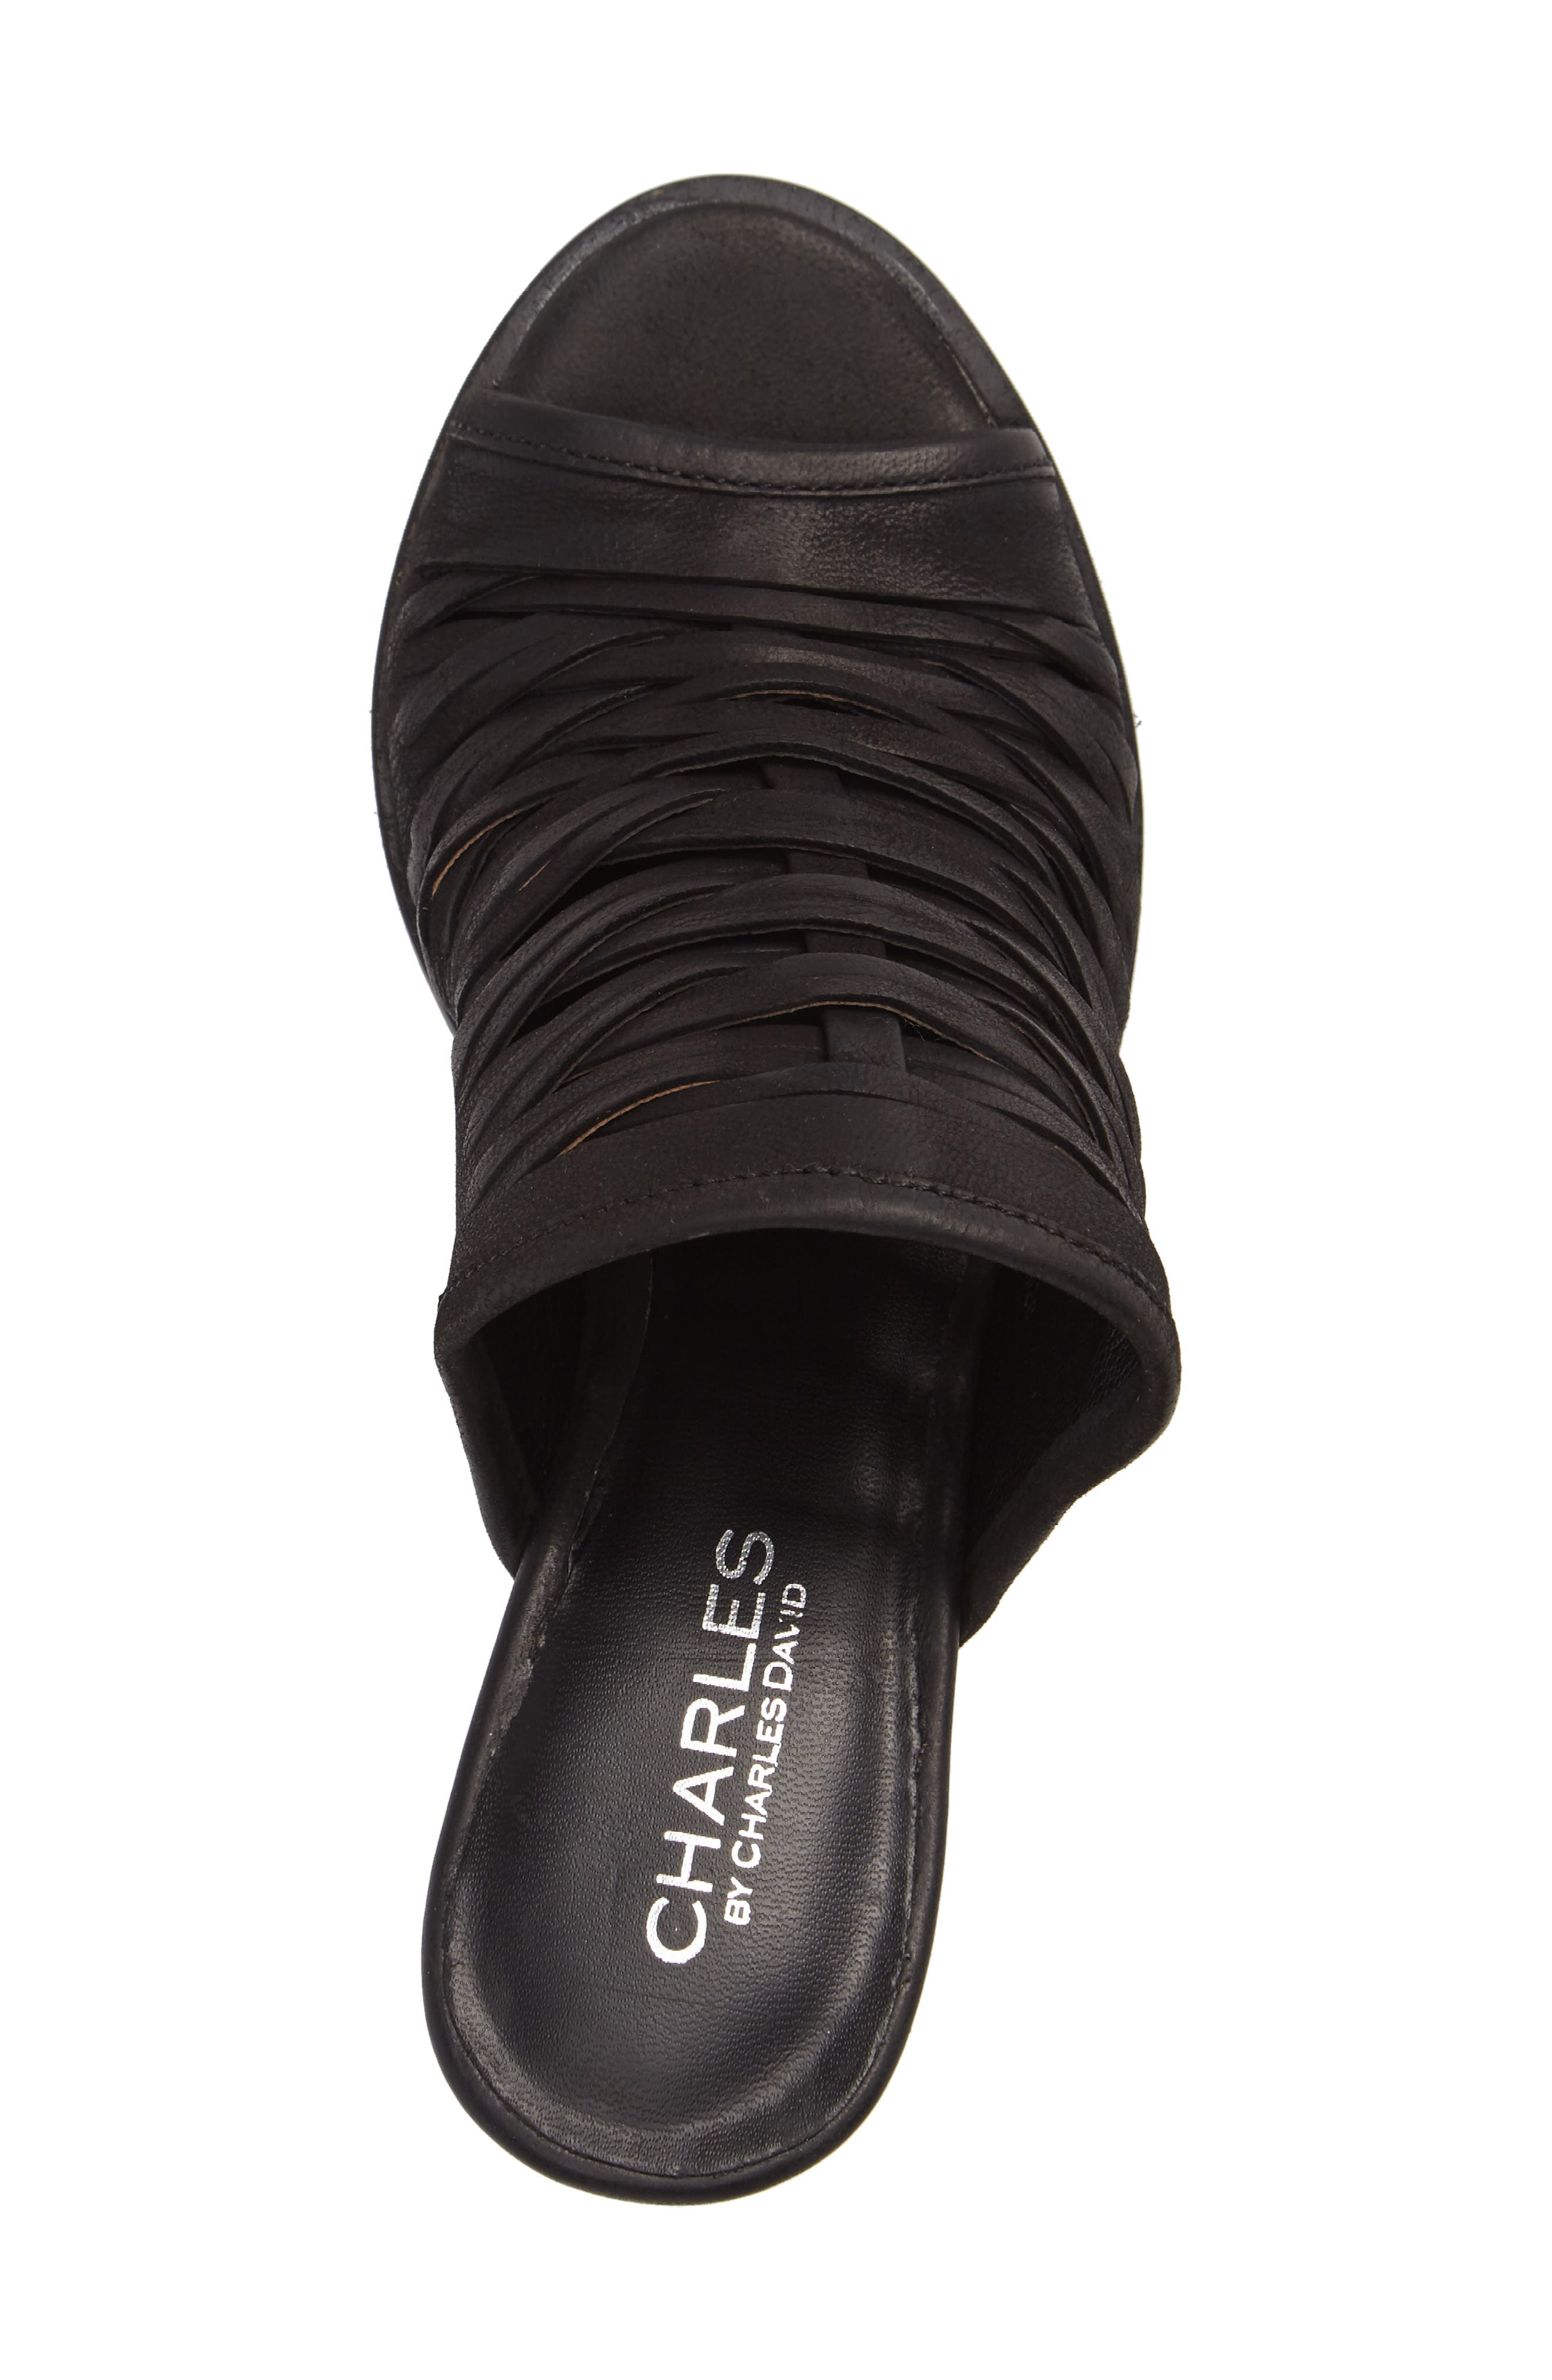 Chris Slivered Sandal,                             Alternate thumbnail 3, color,                             Black Leather